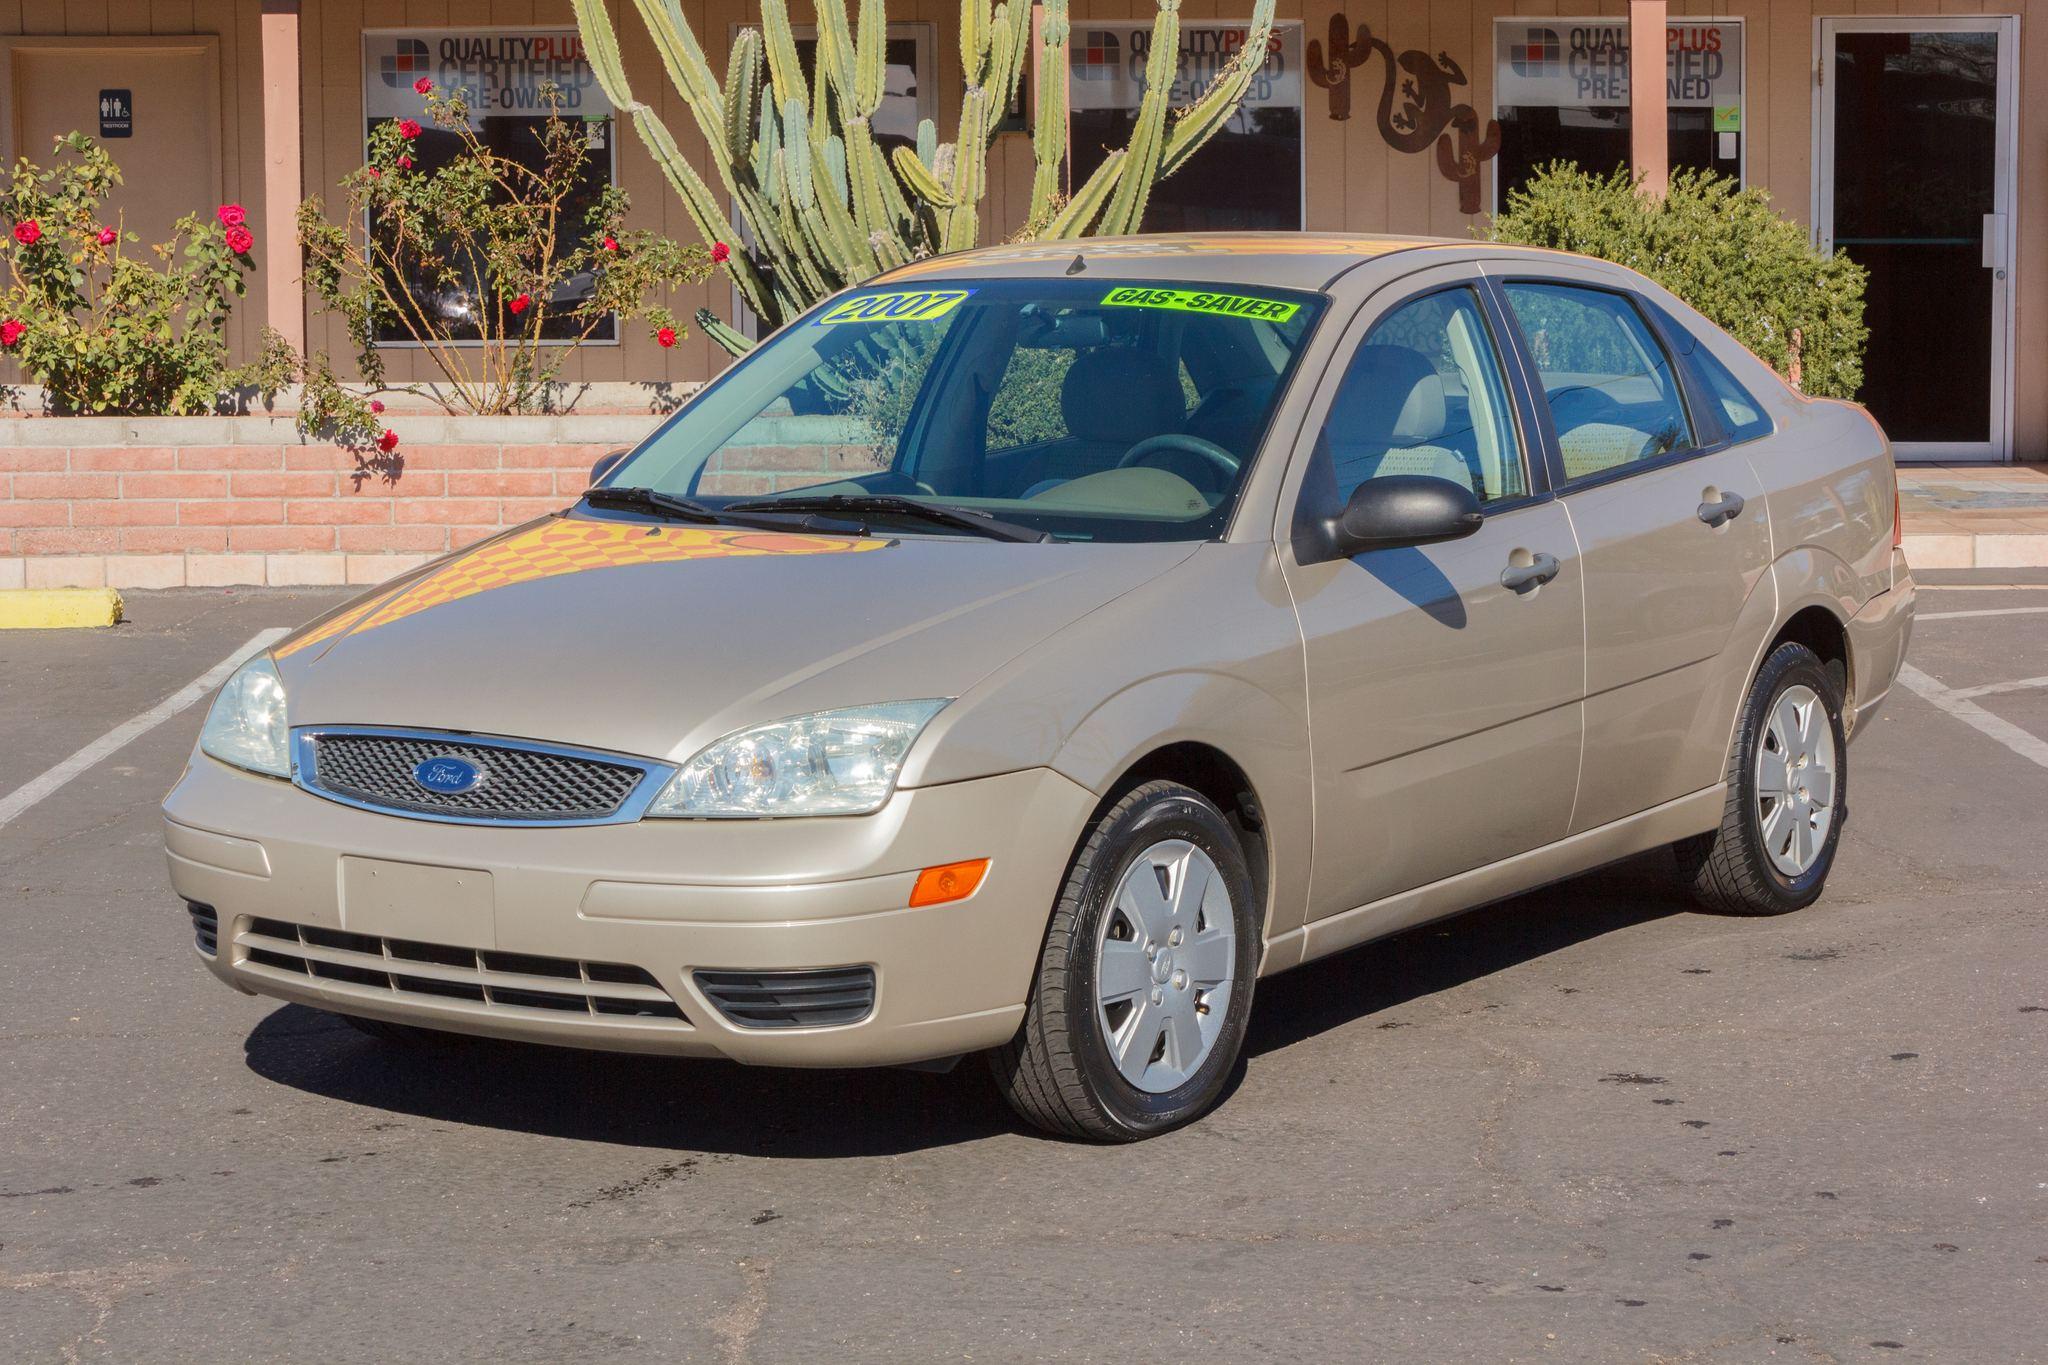 Photo of 2007 Ford Focus 4d Sedan ZX4 SE Pueblo Gold Clearcoat Metallic